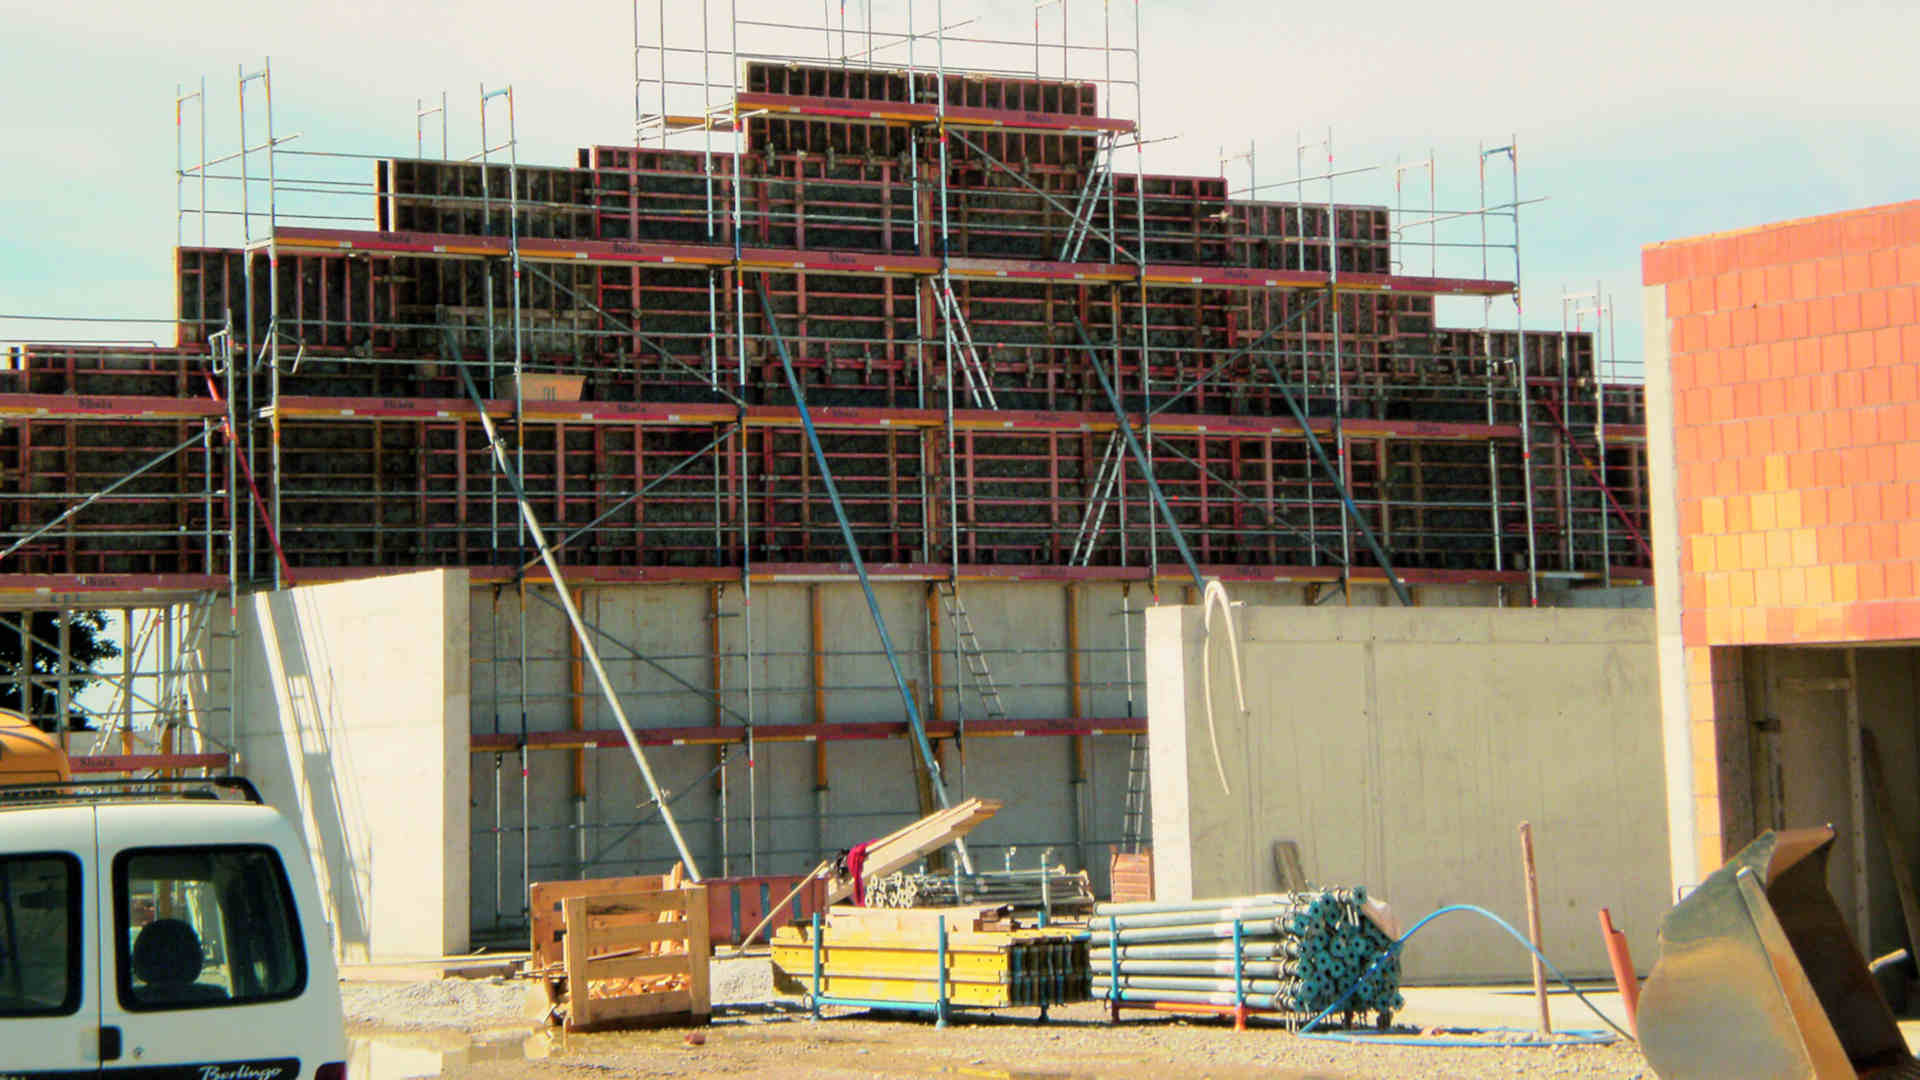 Baustelle des Baugeschäfts W. Semtner GmbH in Mauerstetten bei Kaufbeuren